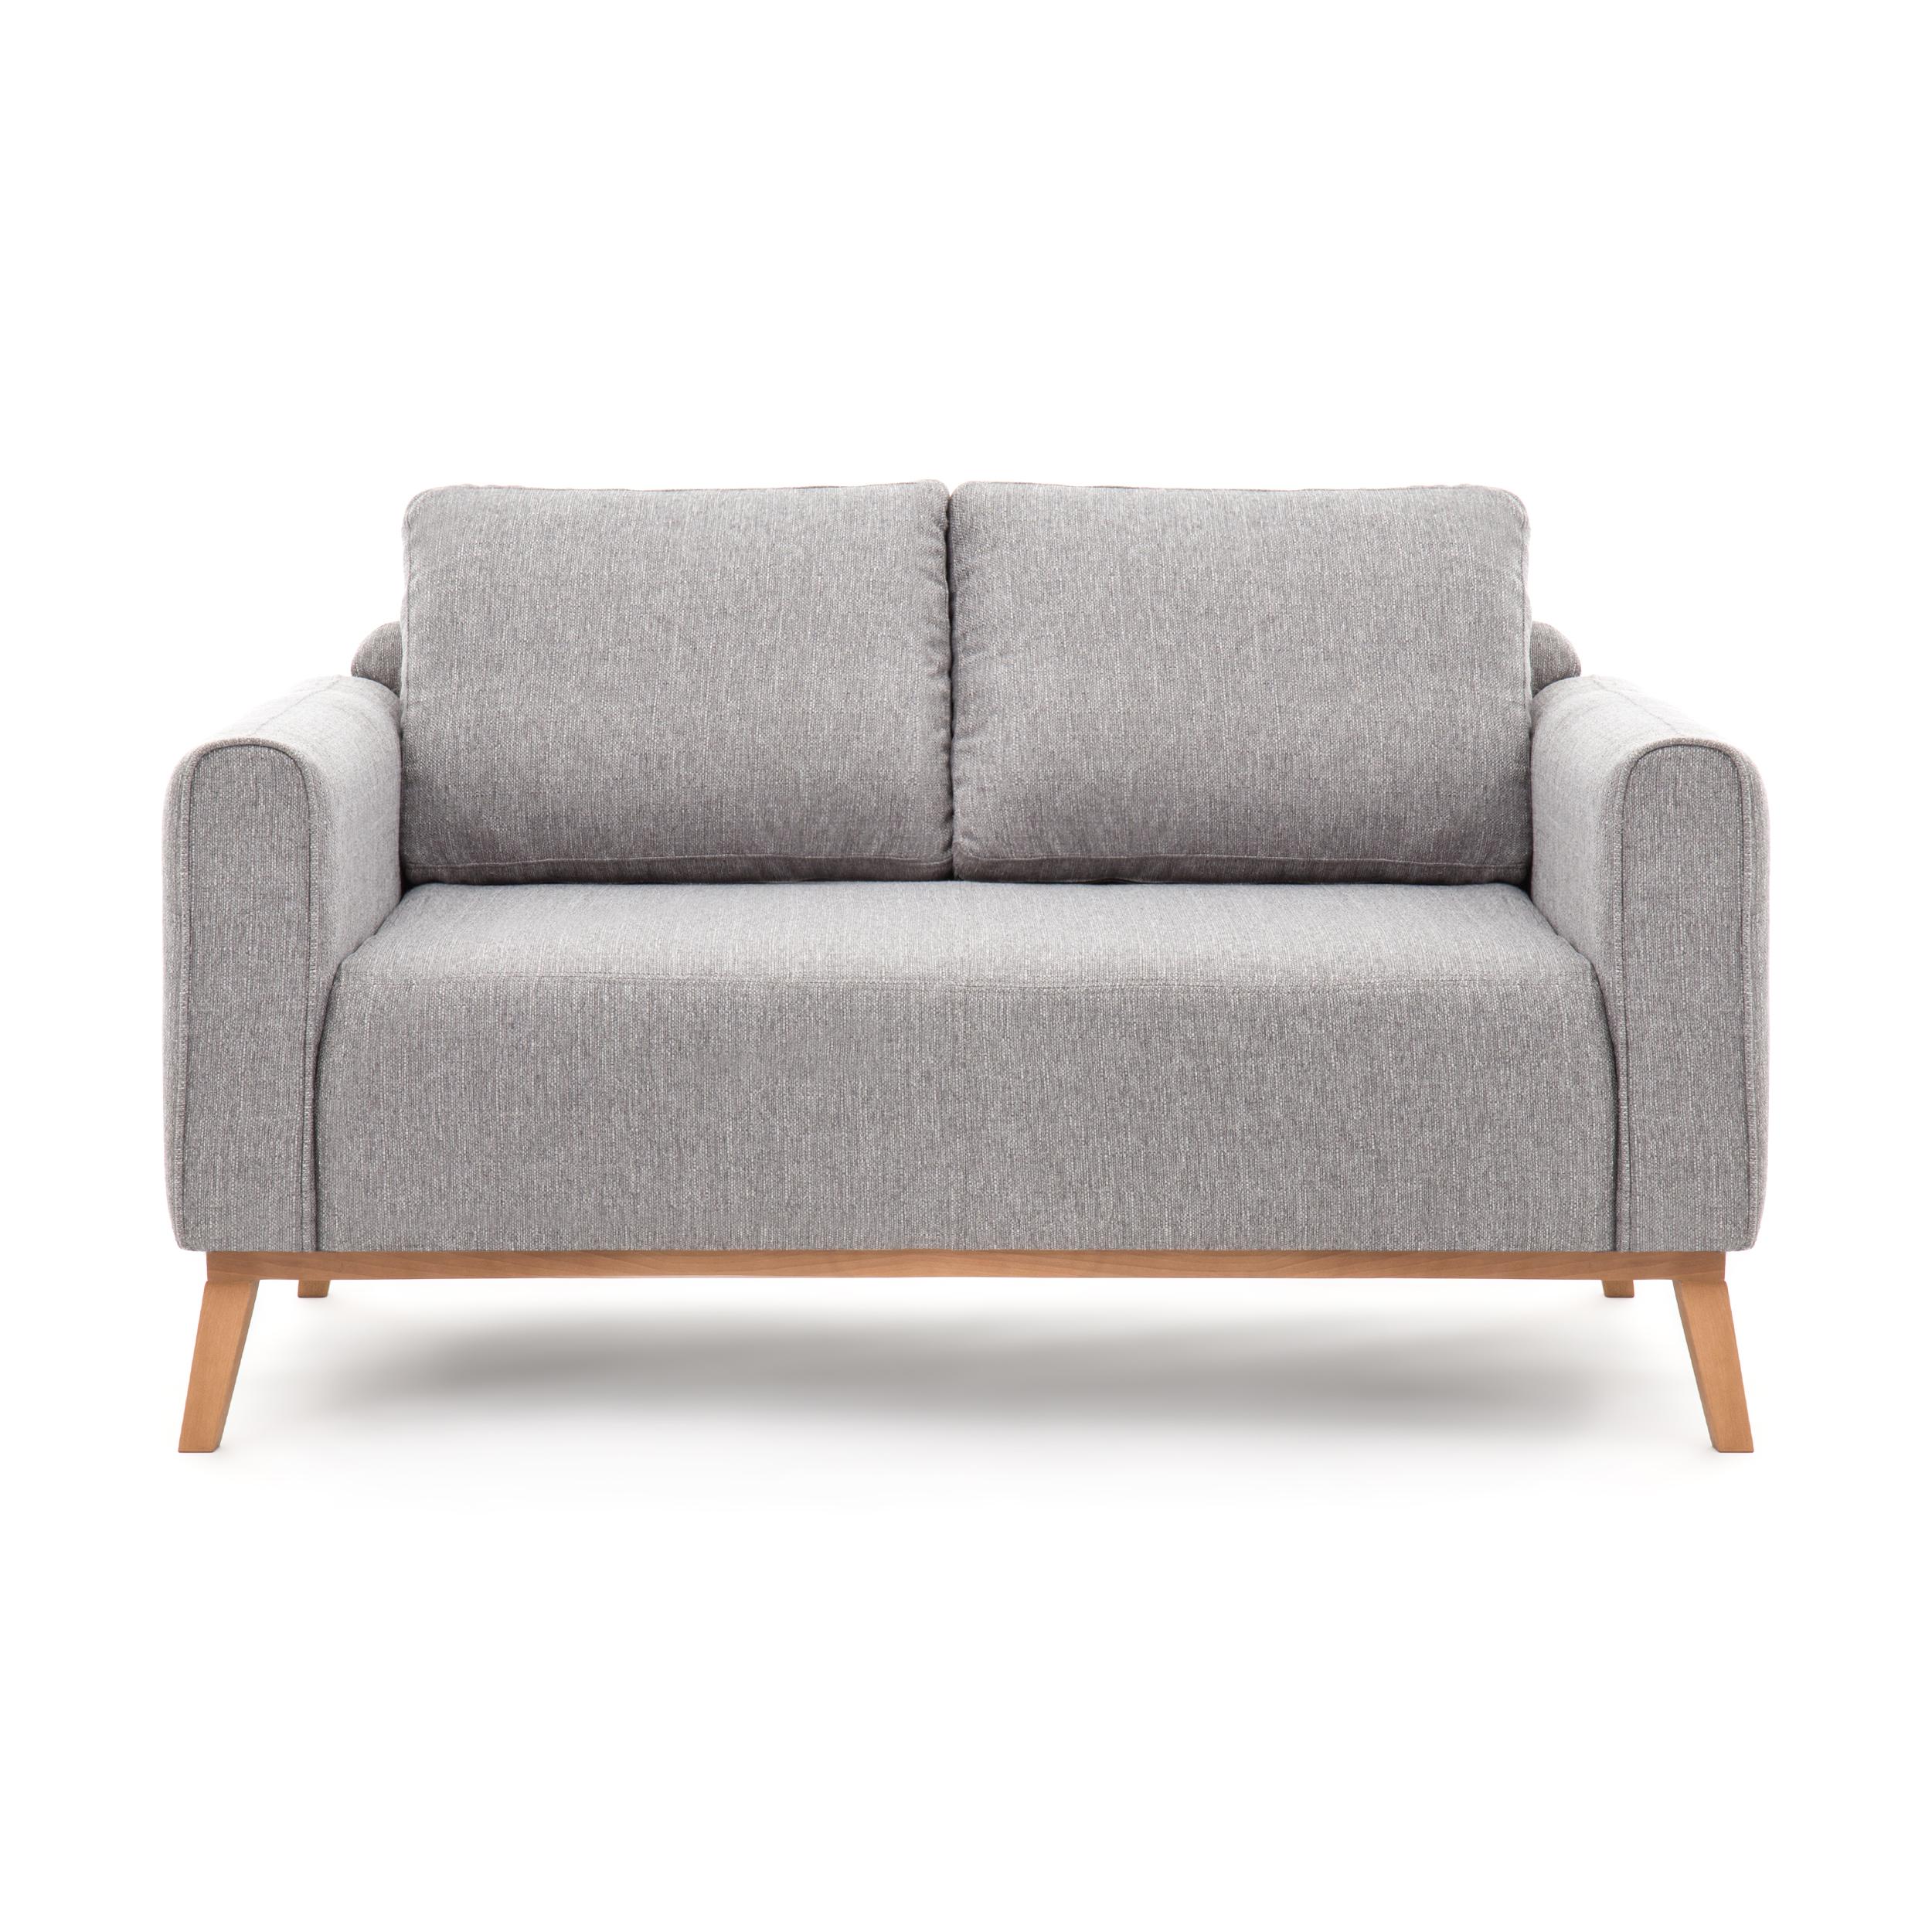 Canapea Fixa 2 locuri Milton Light Grey